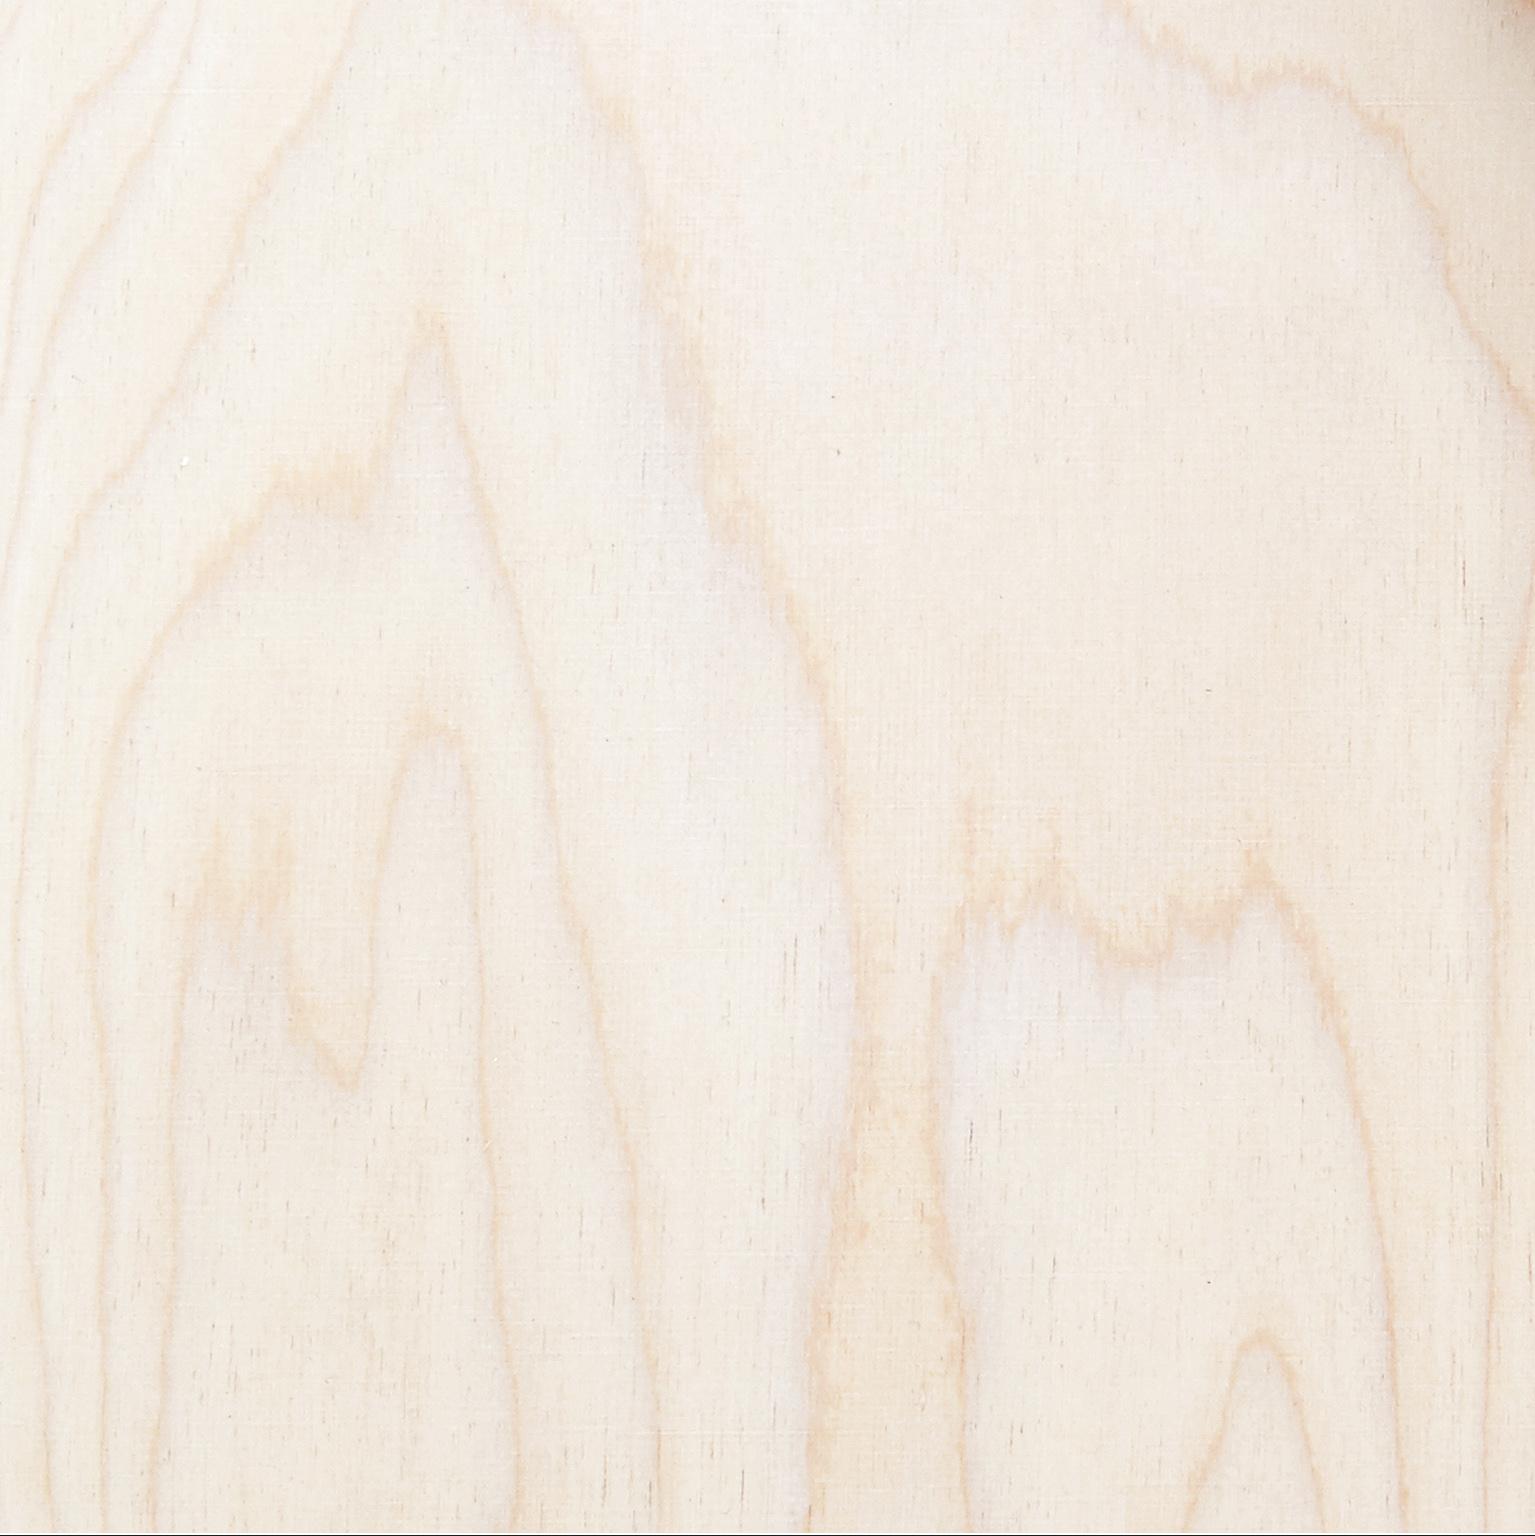 SoWatt-Loft-Plywood-Material-Swatch-Raw-Clear.jpg